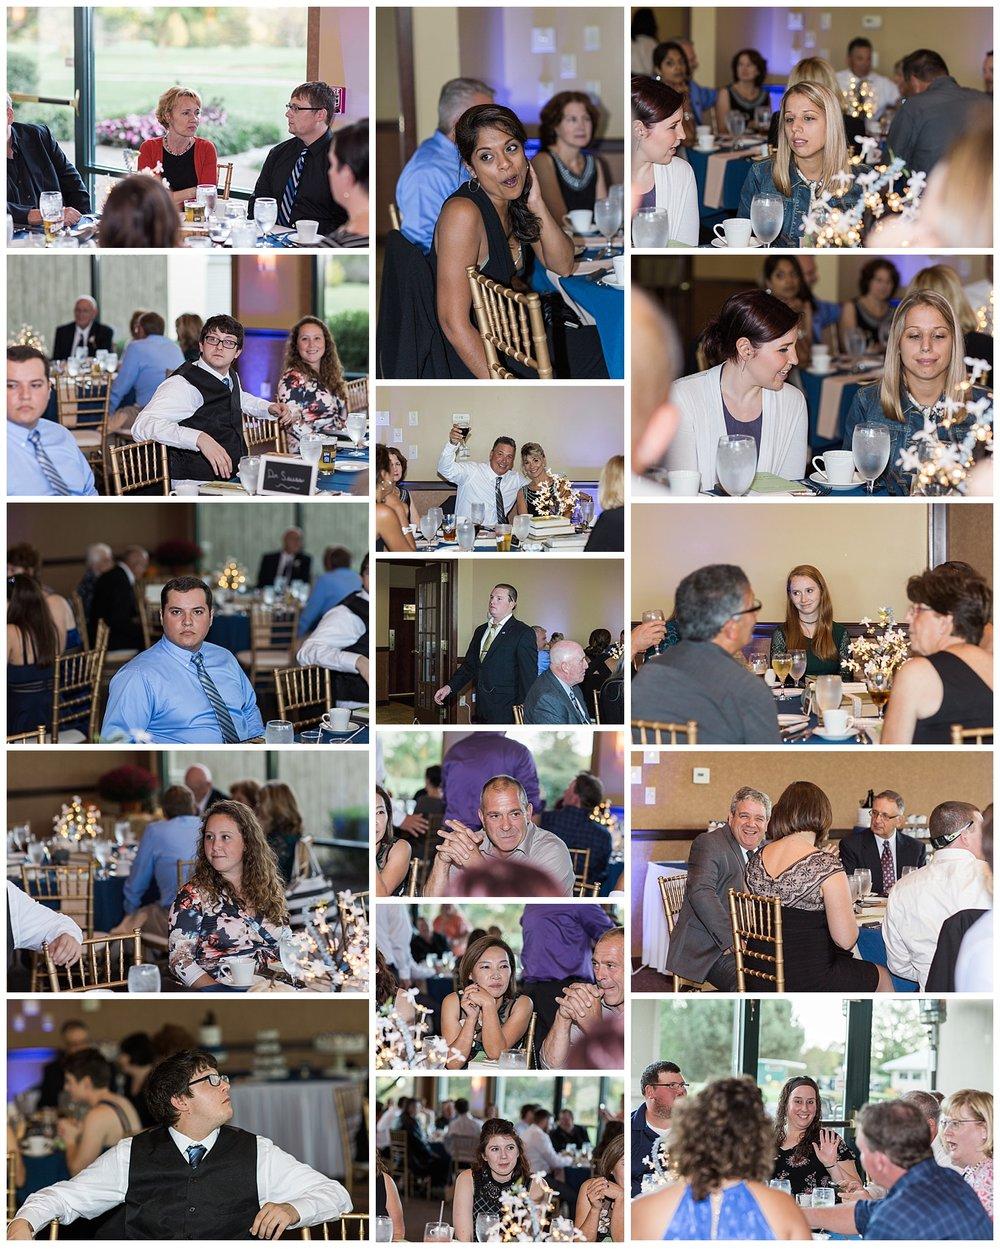 Jessica and Scott McKay - Terry Hills Golf Course - Batavia NY - Lass and Beau-920_Buffalo wedding photography.jpg